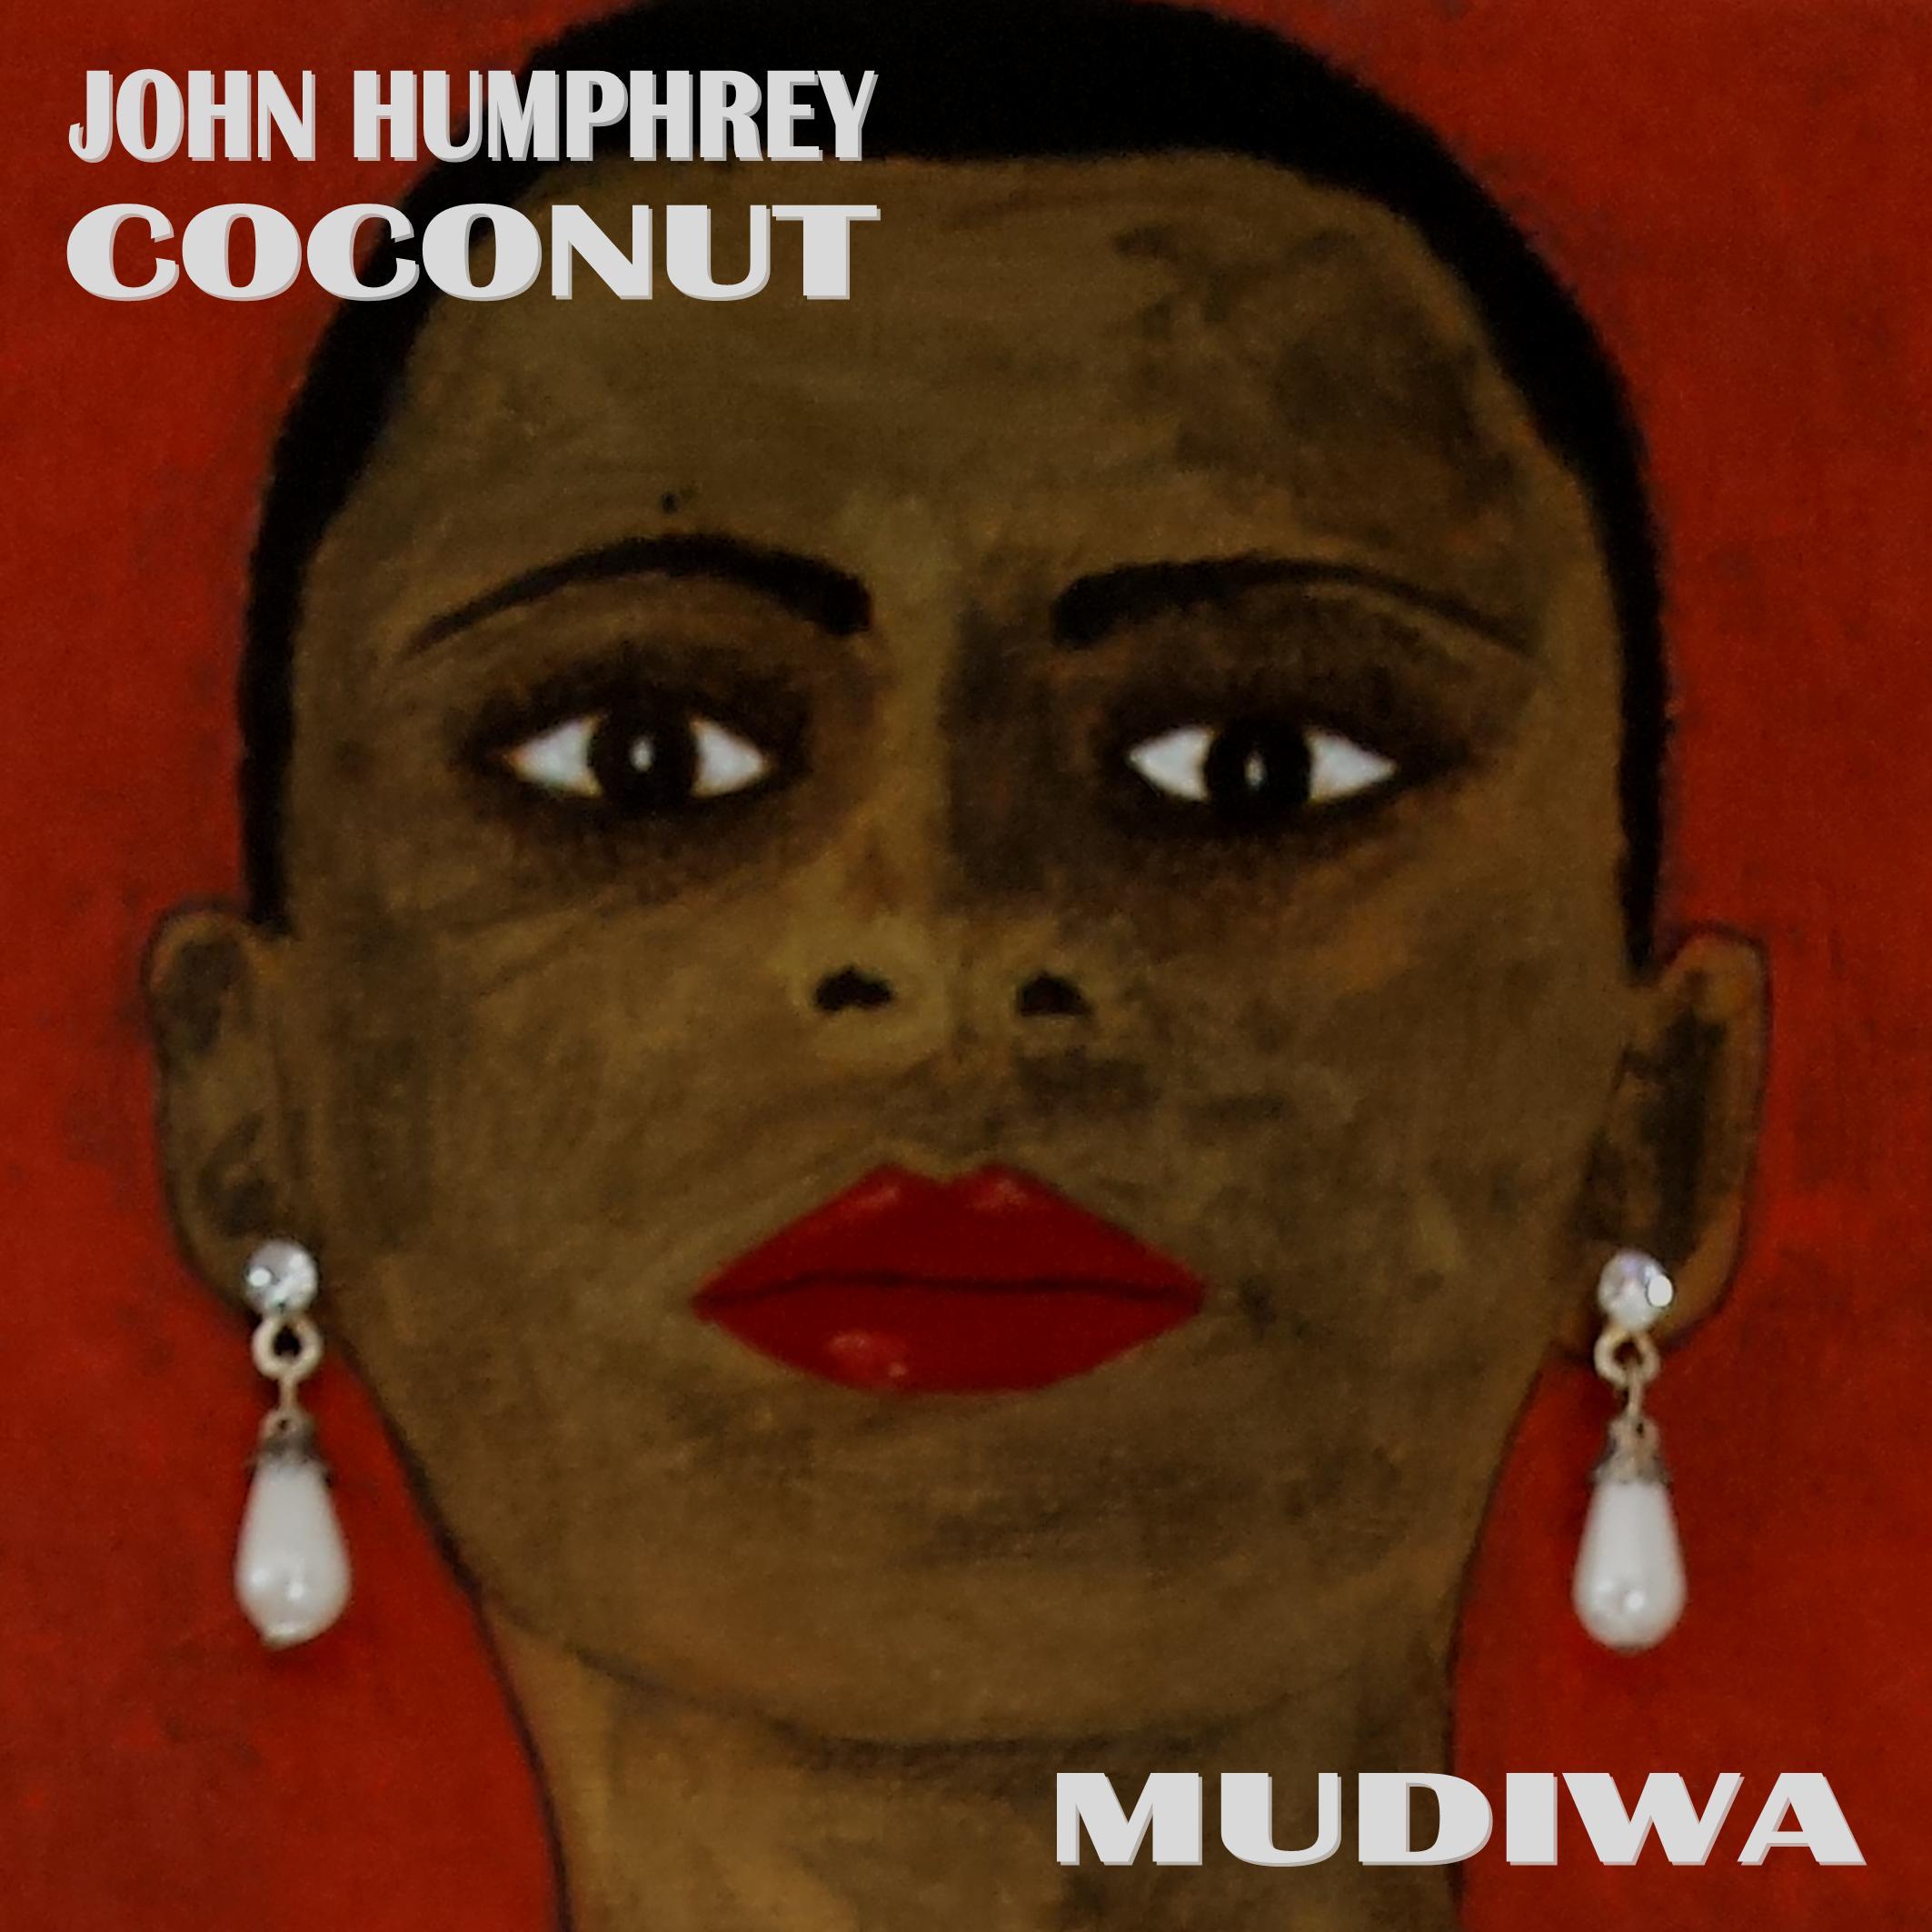 John Humphrey Coconut - Mudiwa